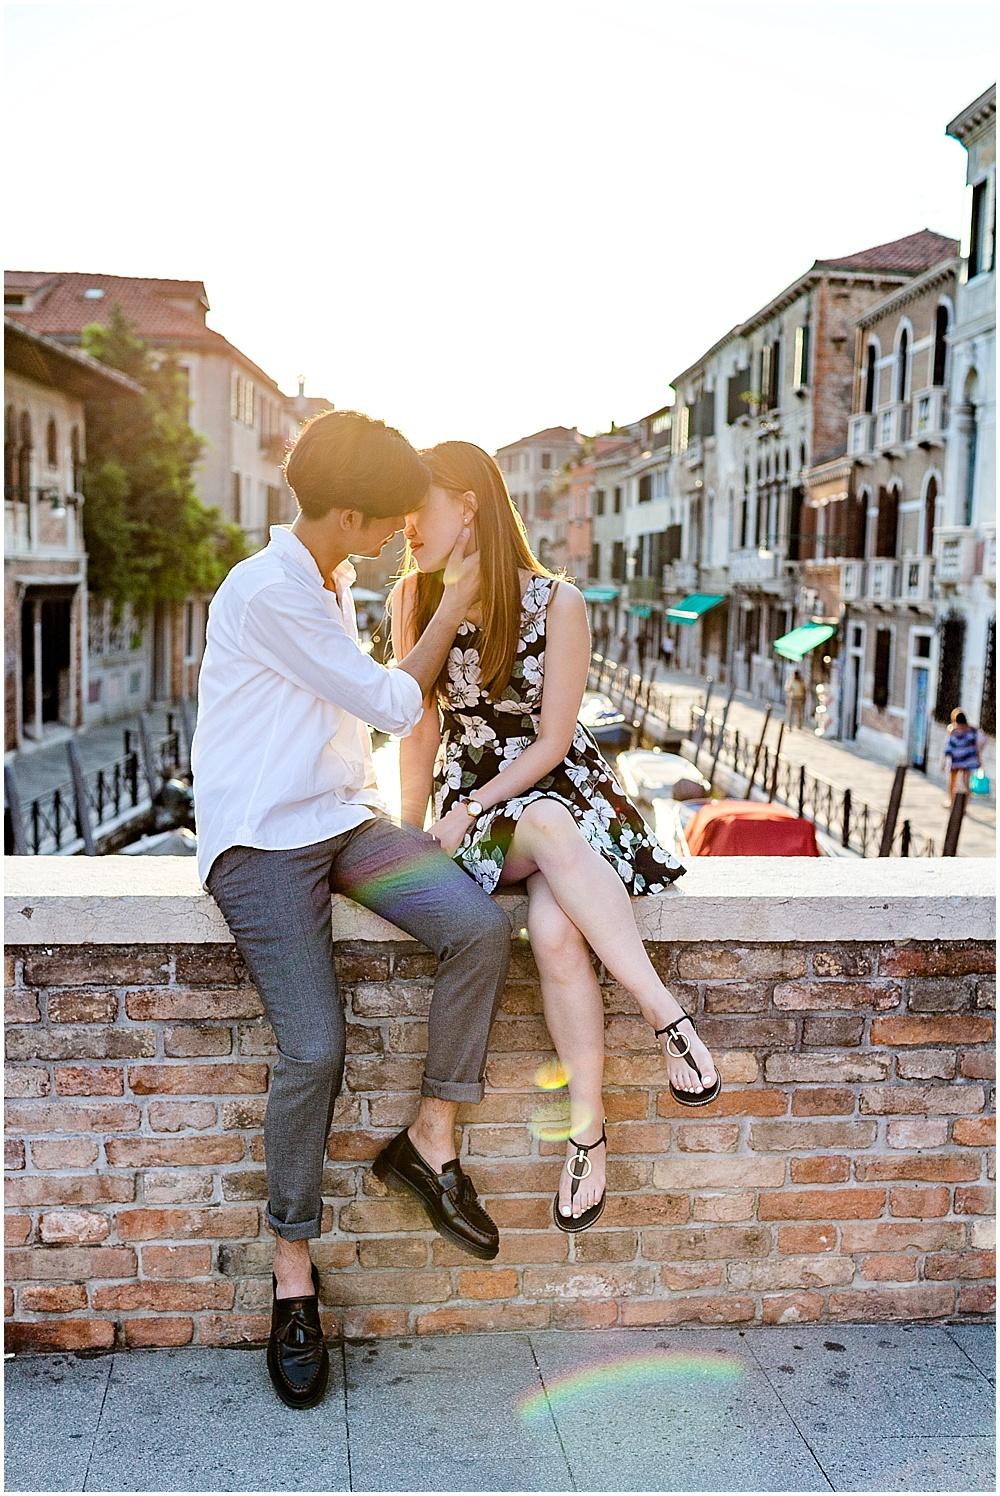 romantic-photoshoot-venice-stefano-degirmenci_0116.jpg